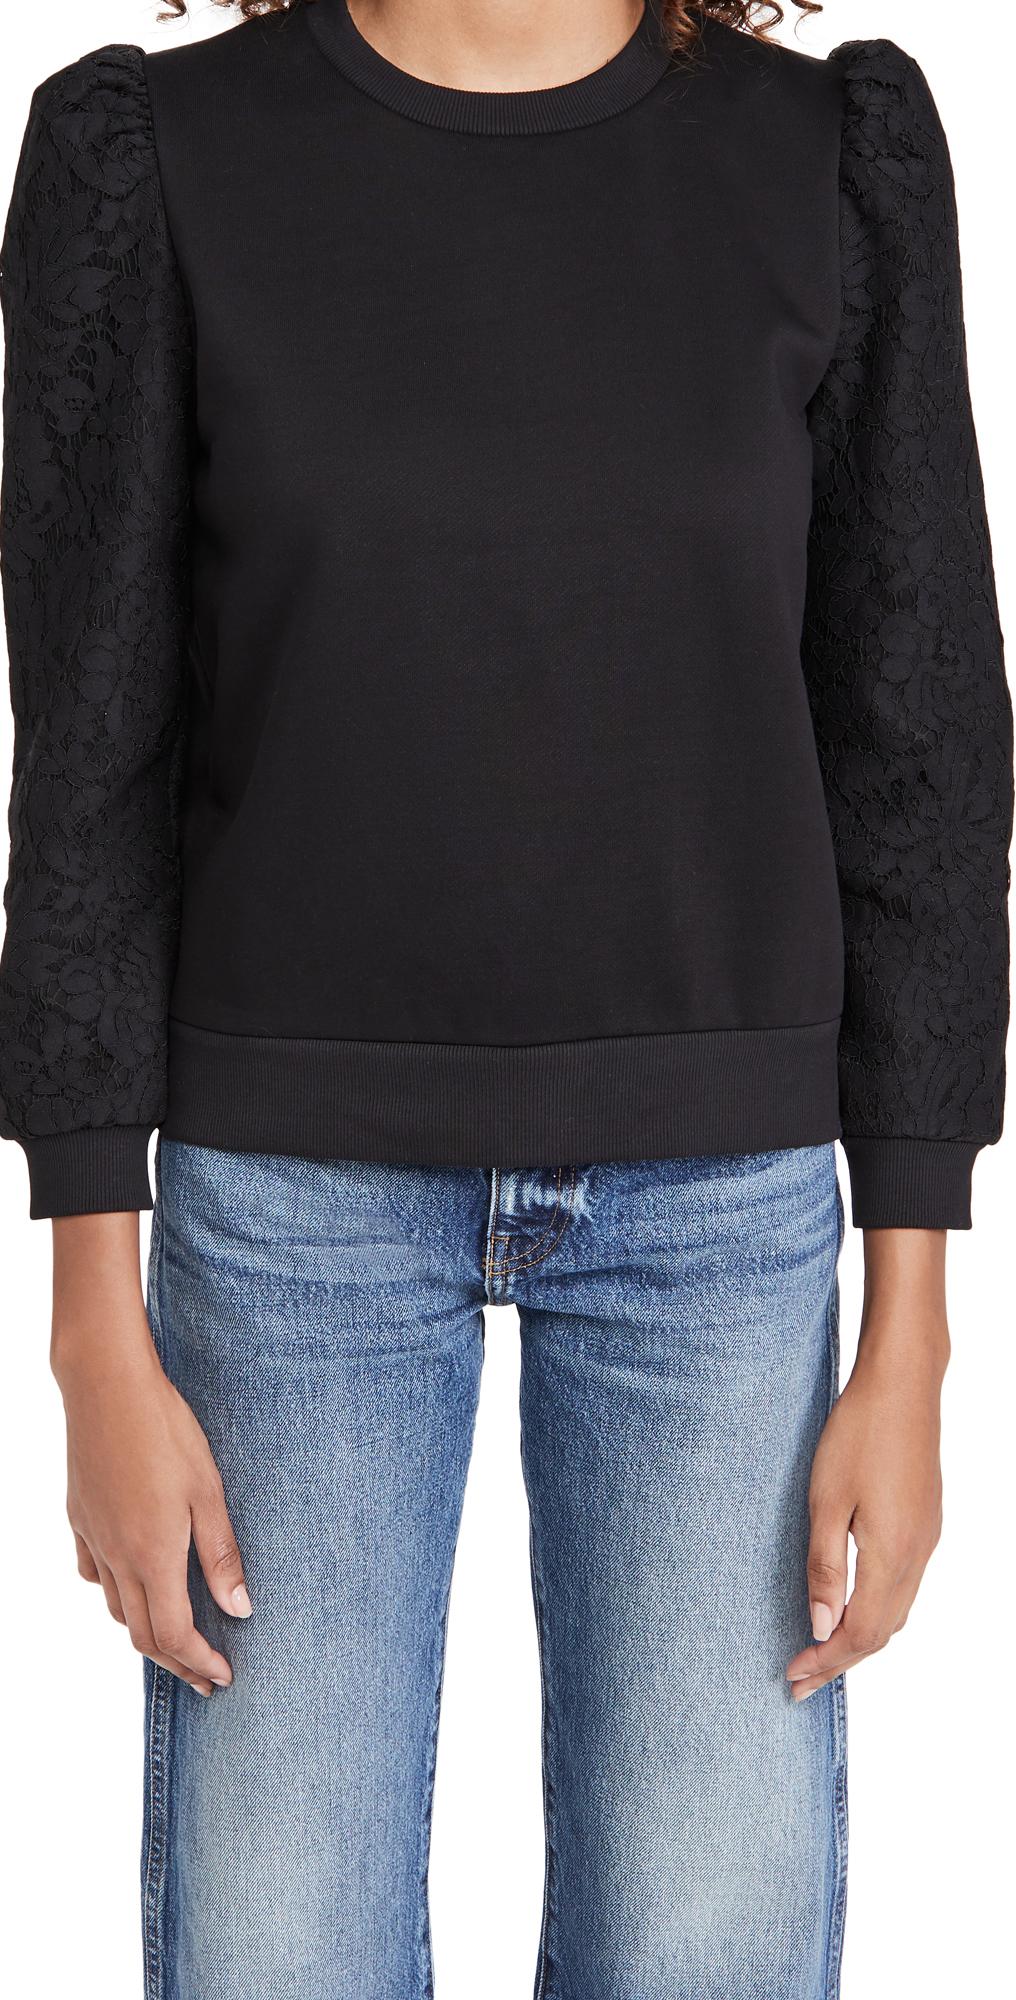 Generation Love Noa Lace Sweatshirt